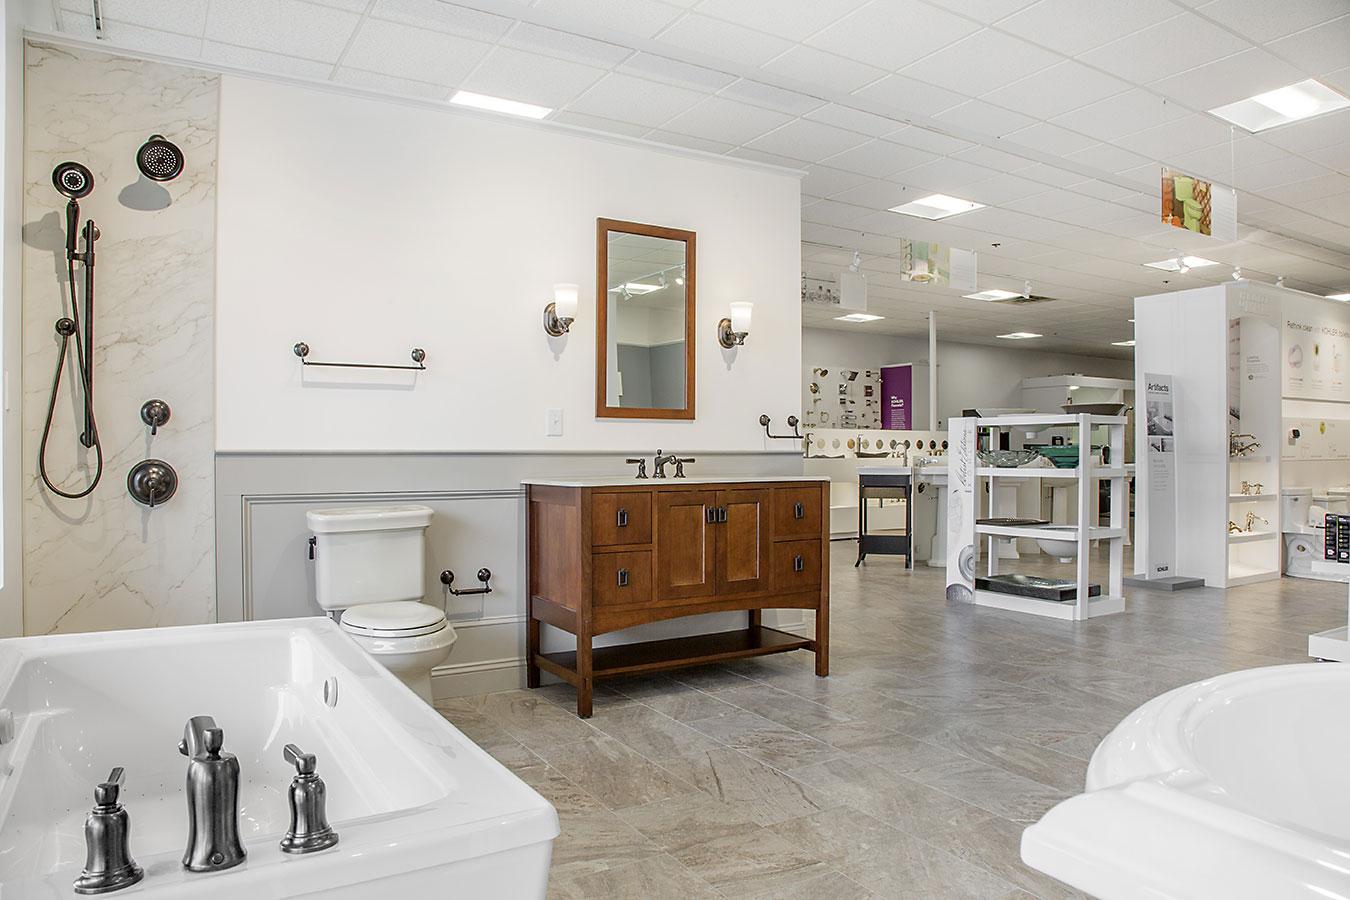 Gentil Showroom Gallery. The Inspired Bath